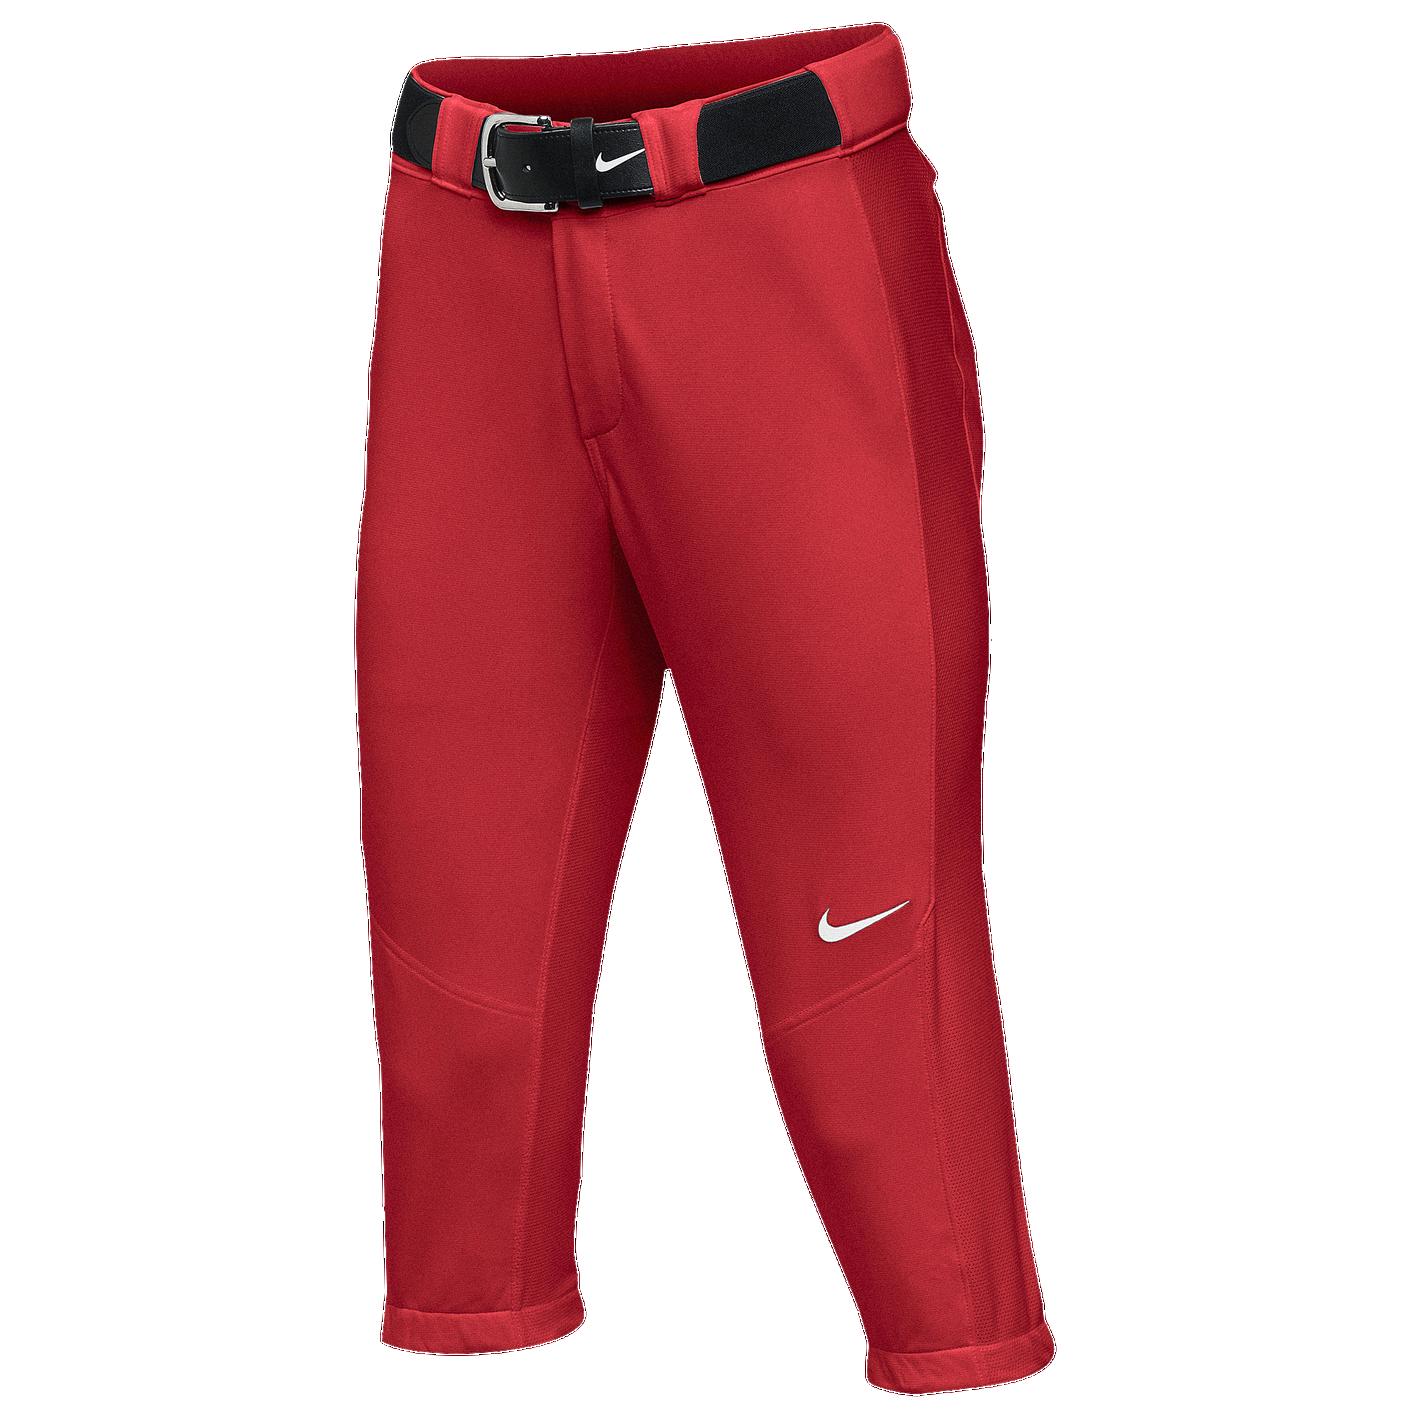 Nike Team Vapor Pro 3 4 Pants - Women s - Softball - Clothing ... bebc9b0481